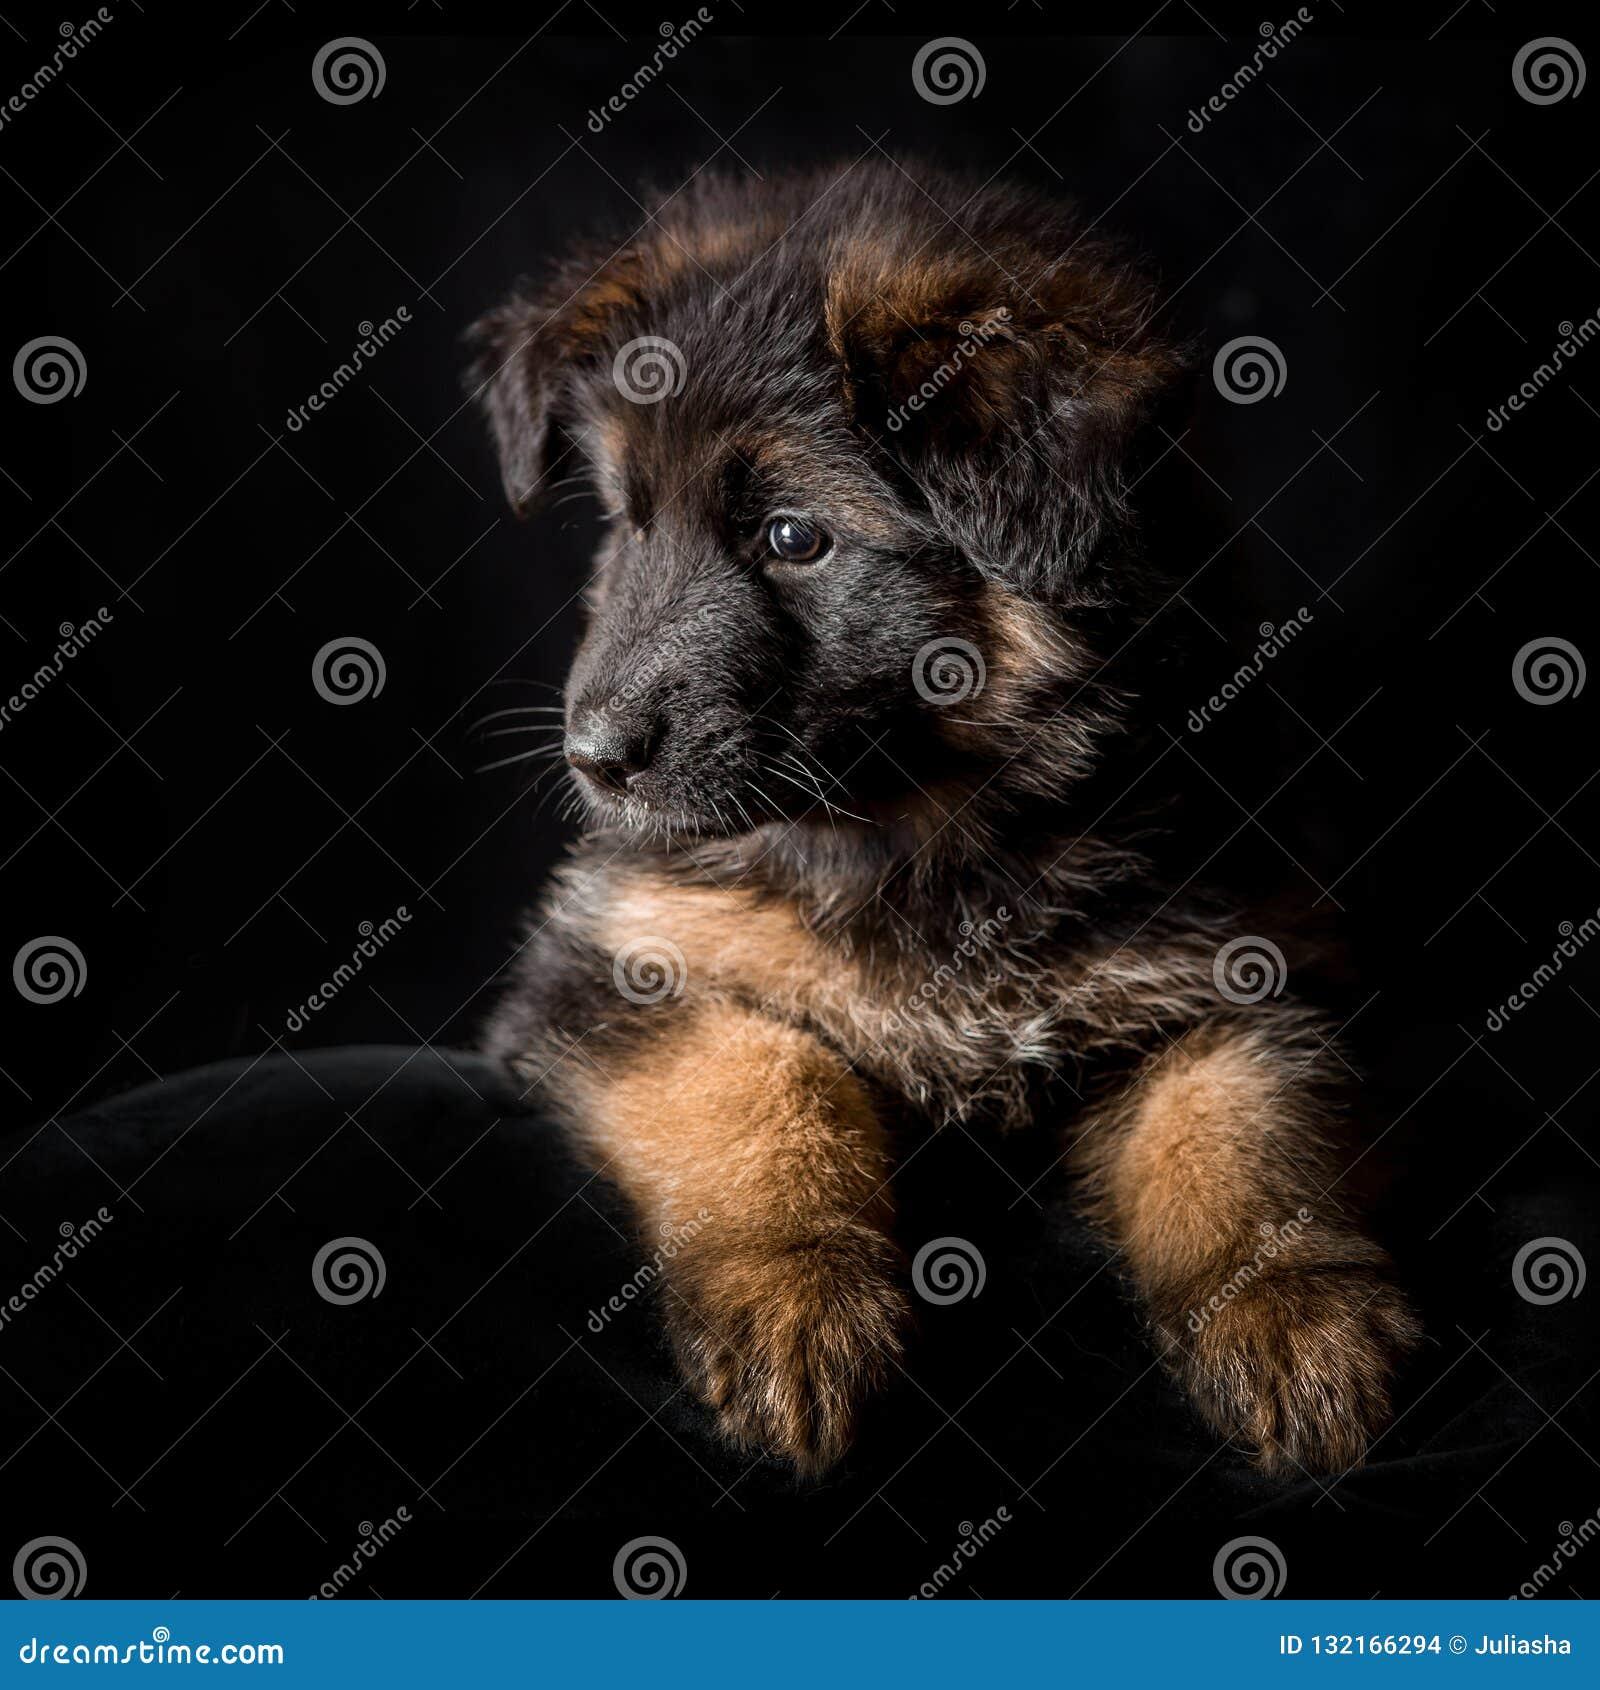 German Shepherd Puppies Studio Portrait On Black Stock Photo Image Of Fluffy Posing 132166294